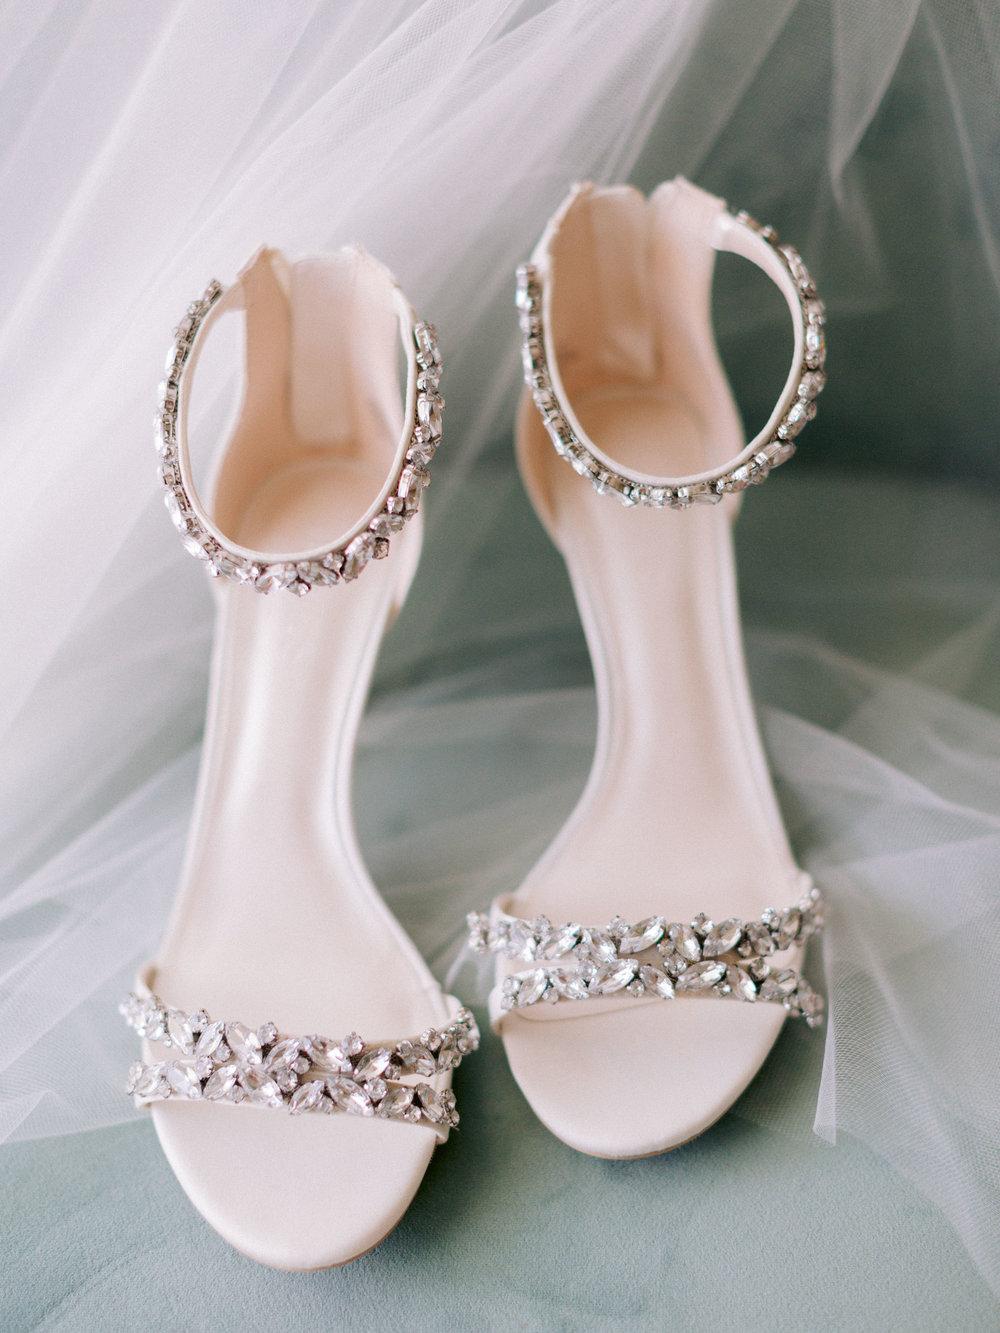 Kim_Jeff_Cancun Wedding_Getting_Ready_Kurtz_Orpia (29 of 105).jpg